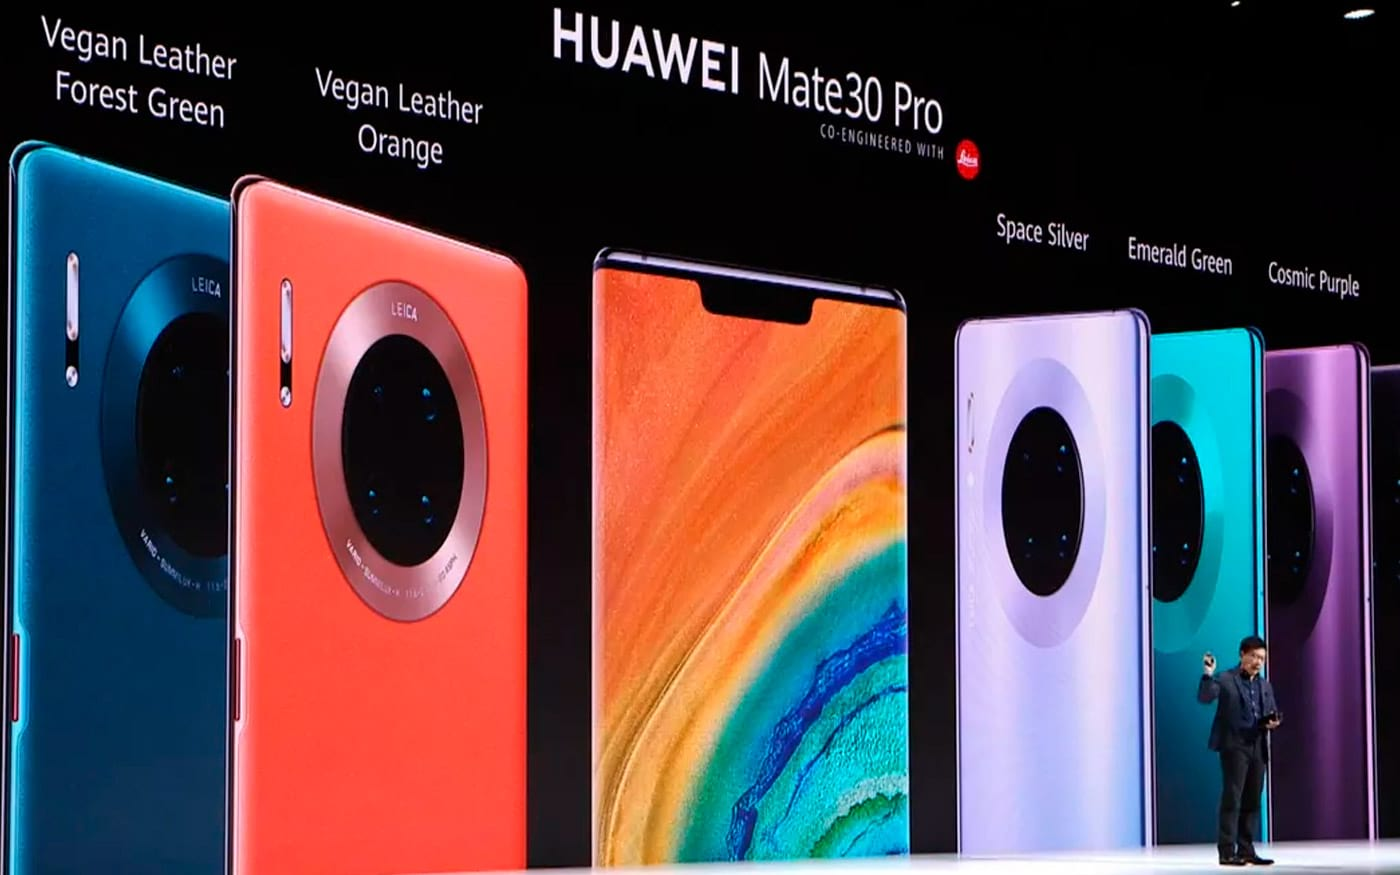 Huawei lança o Mate 30 Pro, sem Google Play